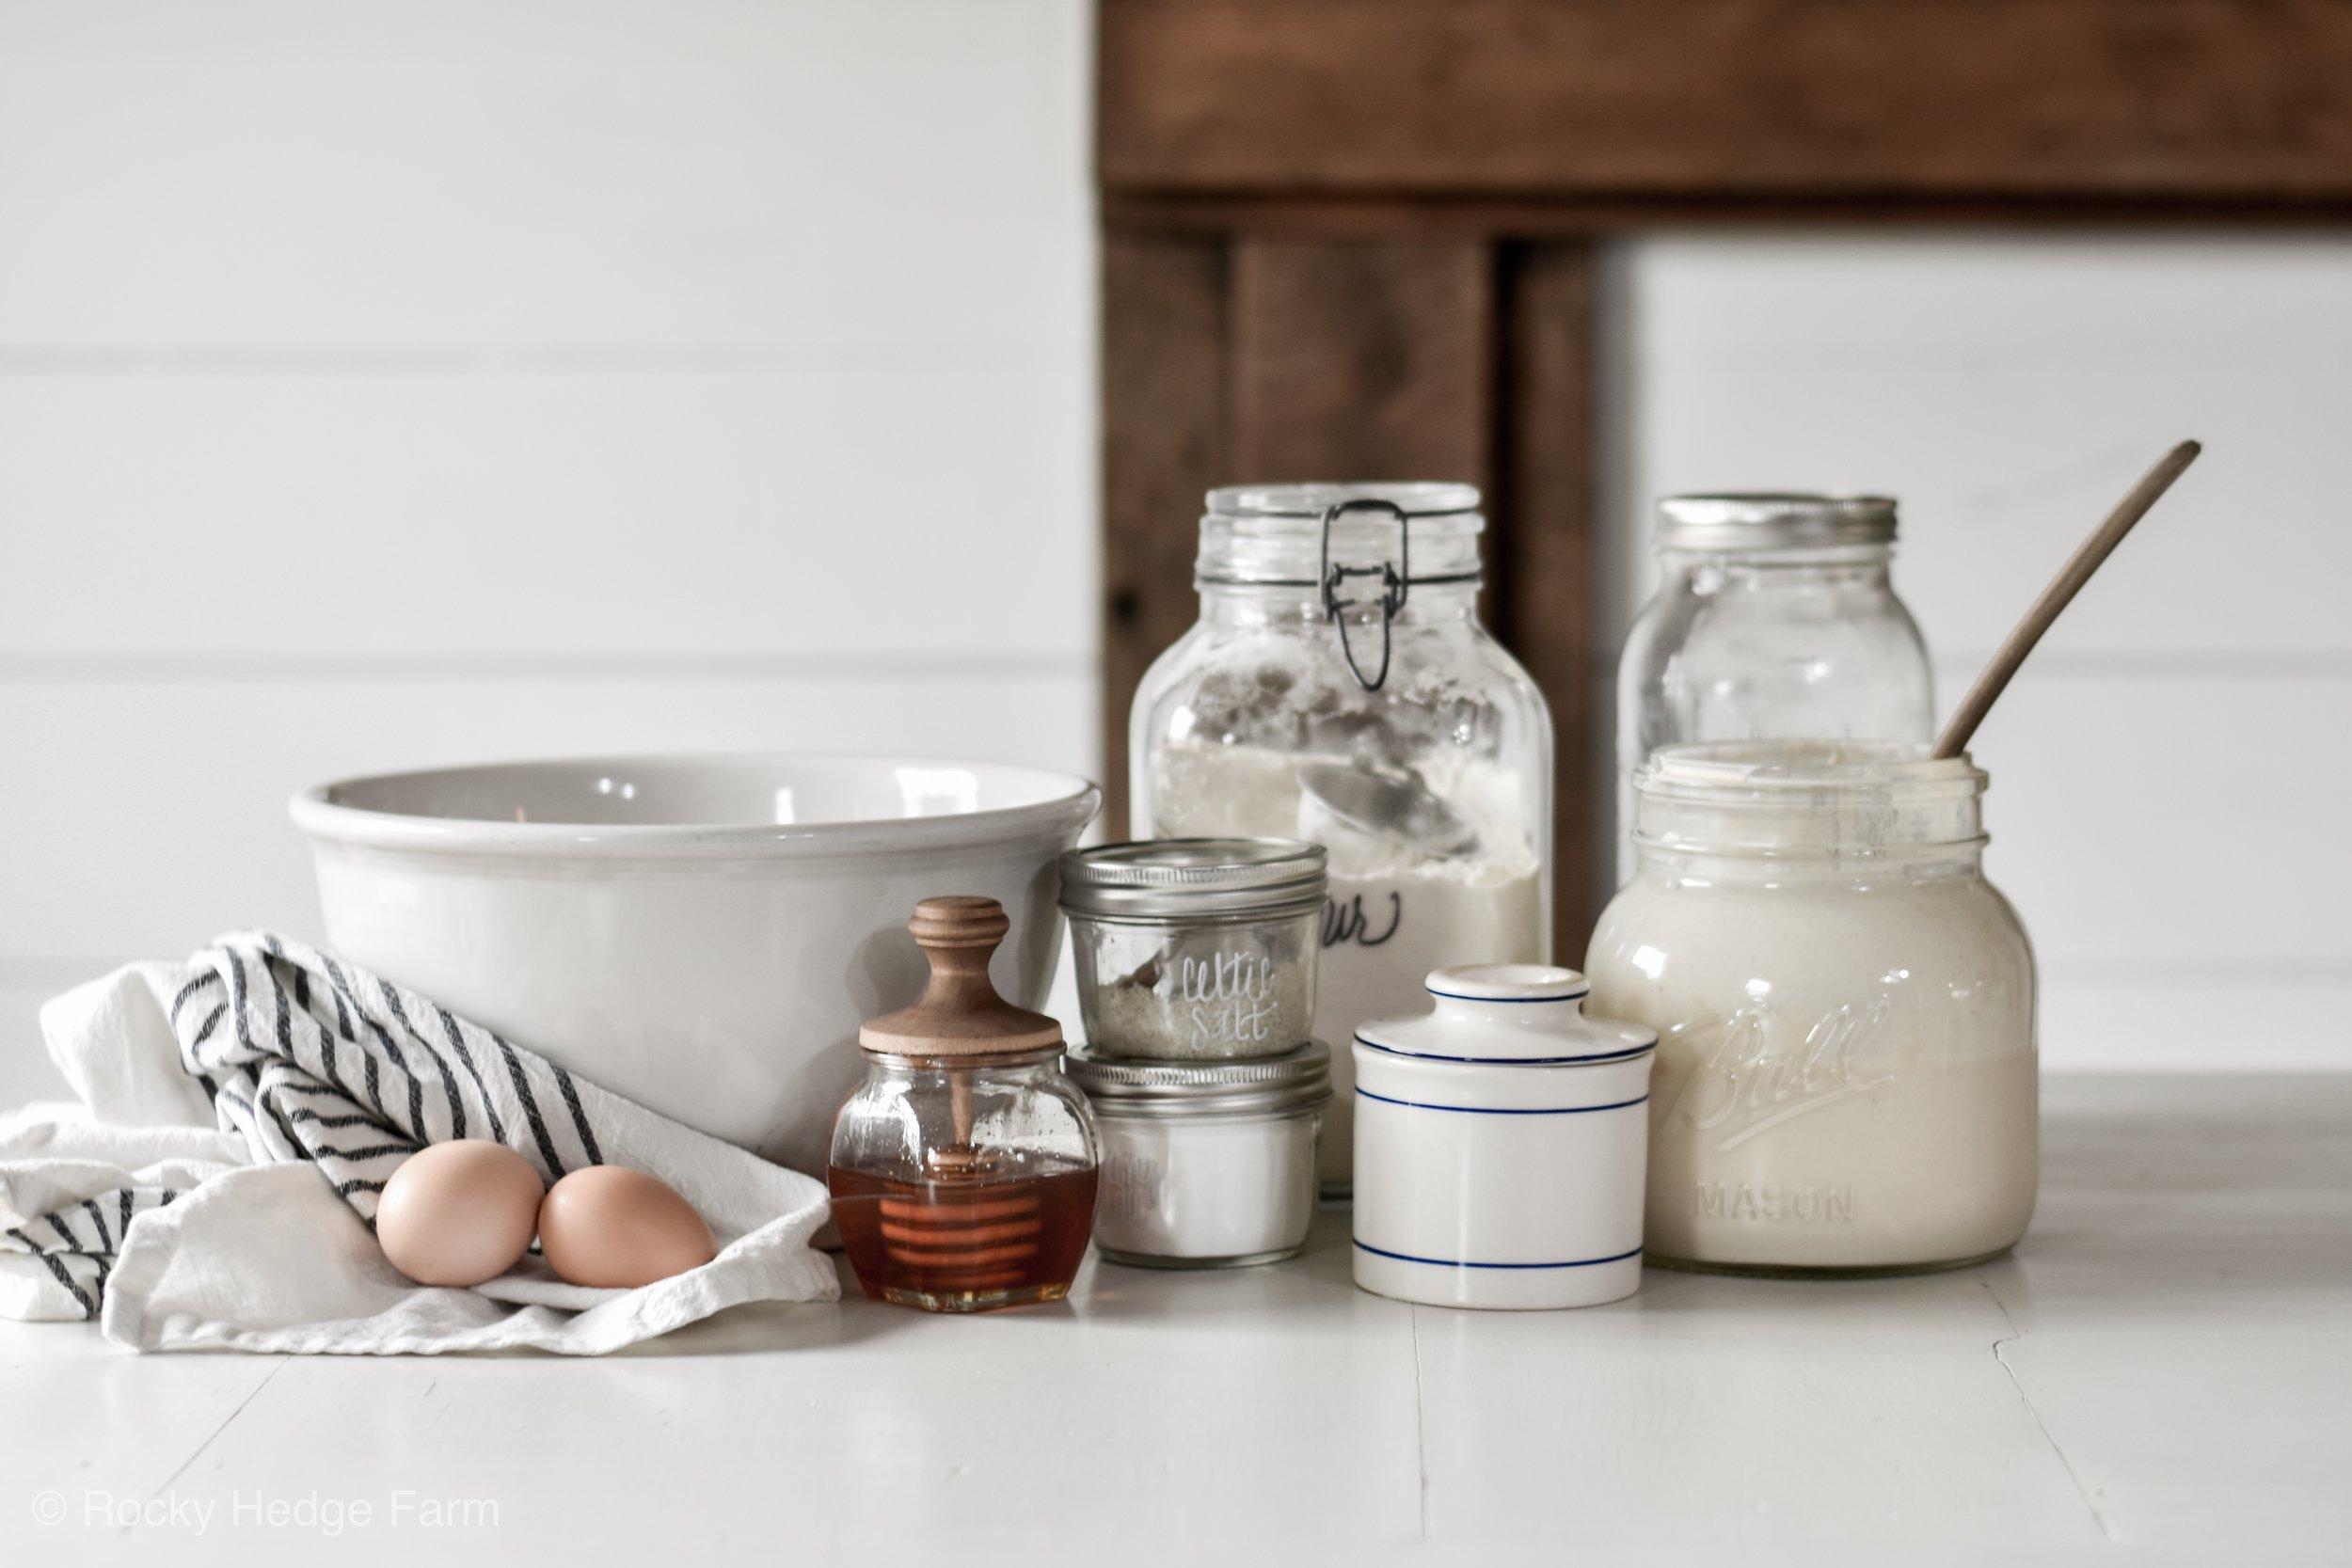 Overnight Sourdough Pancake Recipe   Rocky Hedge Farm